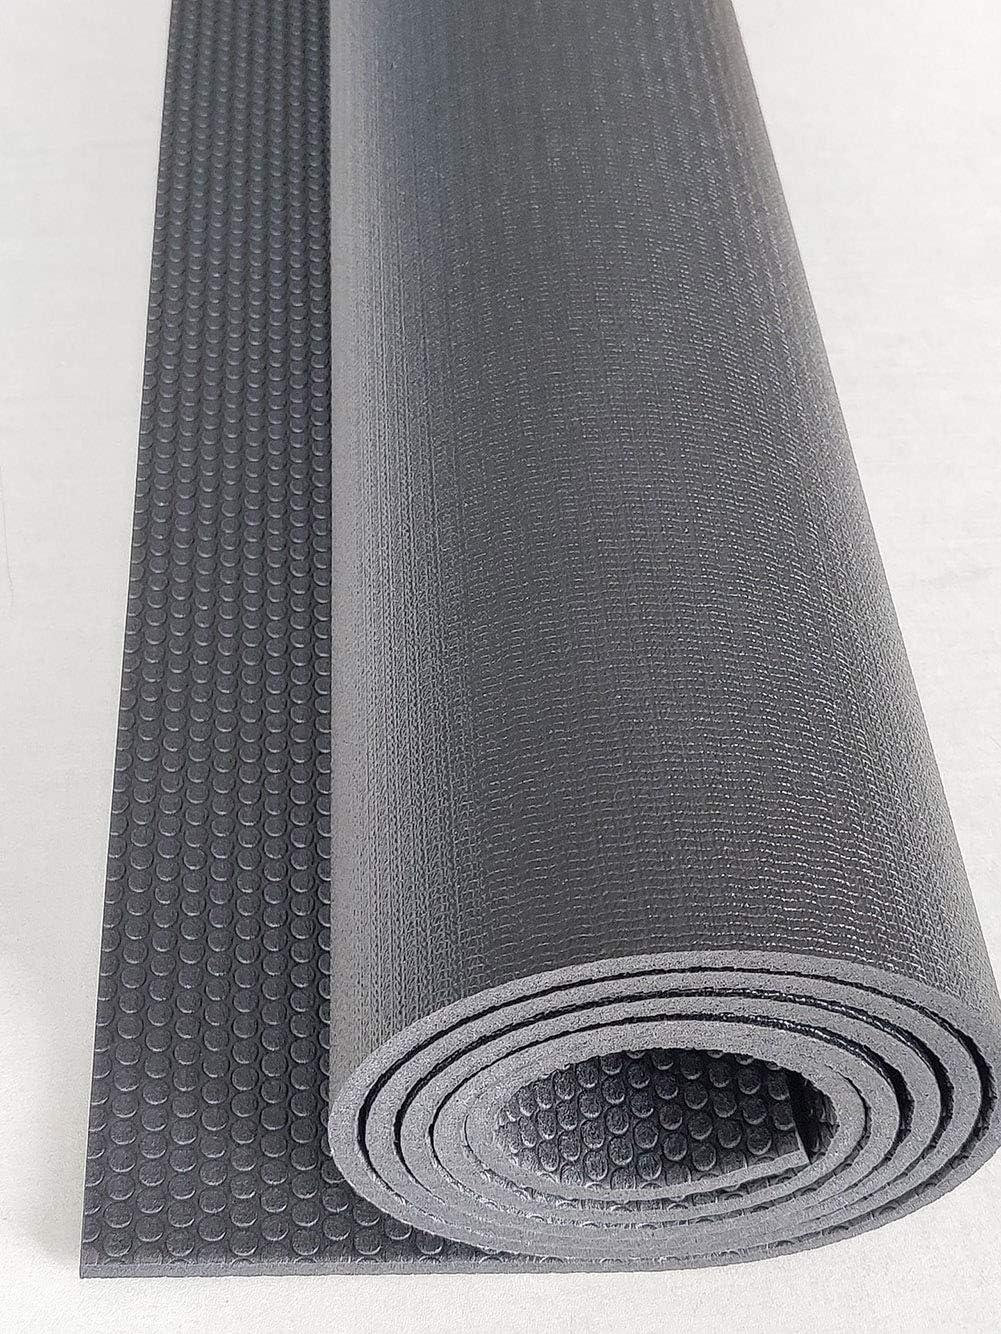 SRFDD Exercise Equipment Mat,PVC Floor Protector Pad Exercise Bike Mat Fitness Mat,Jump Rope Mat Gym Mat